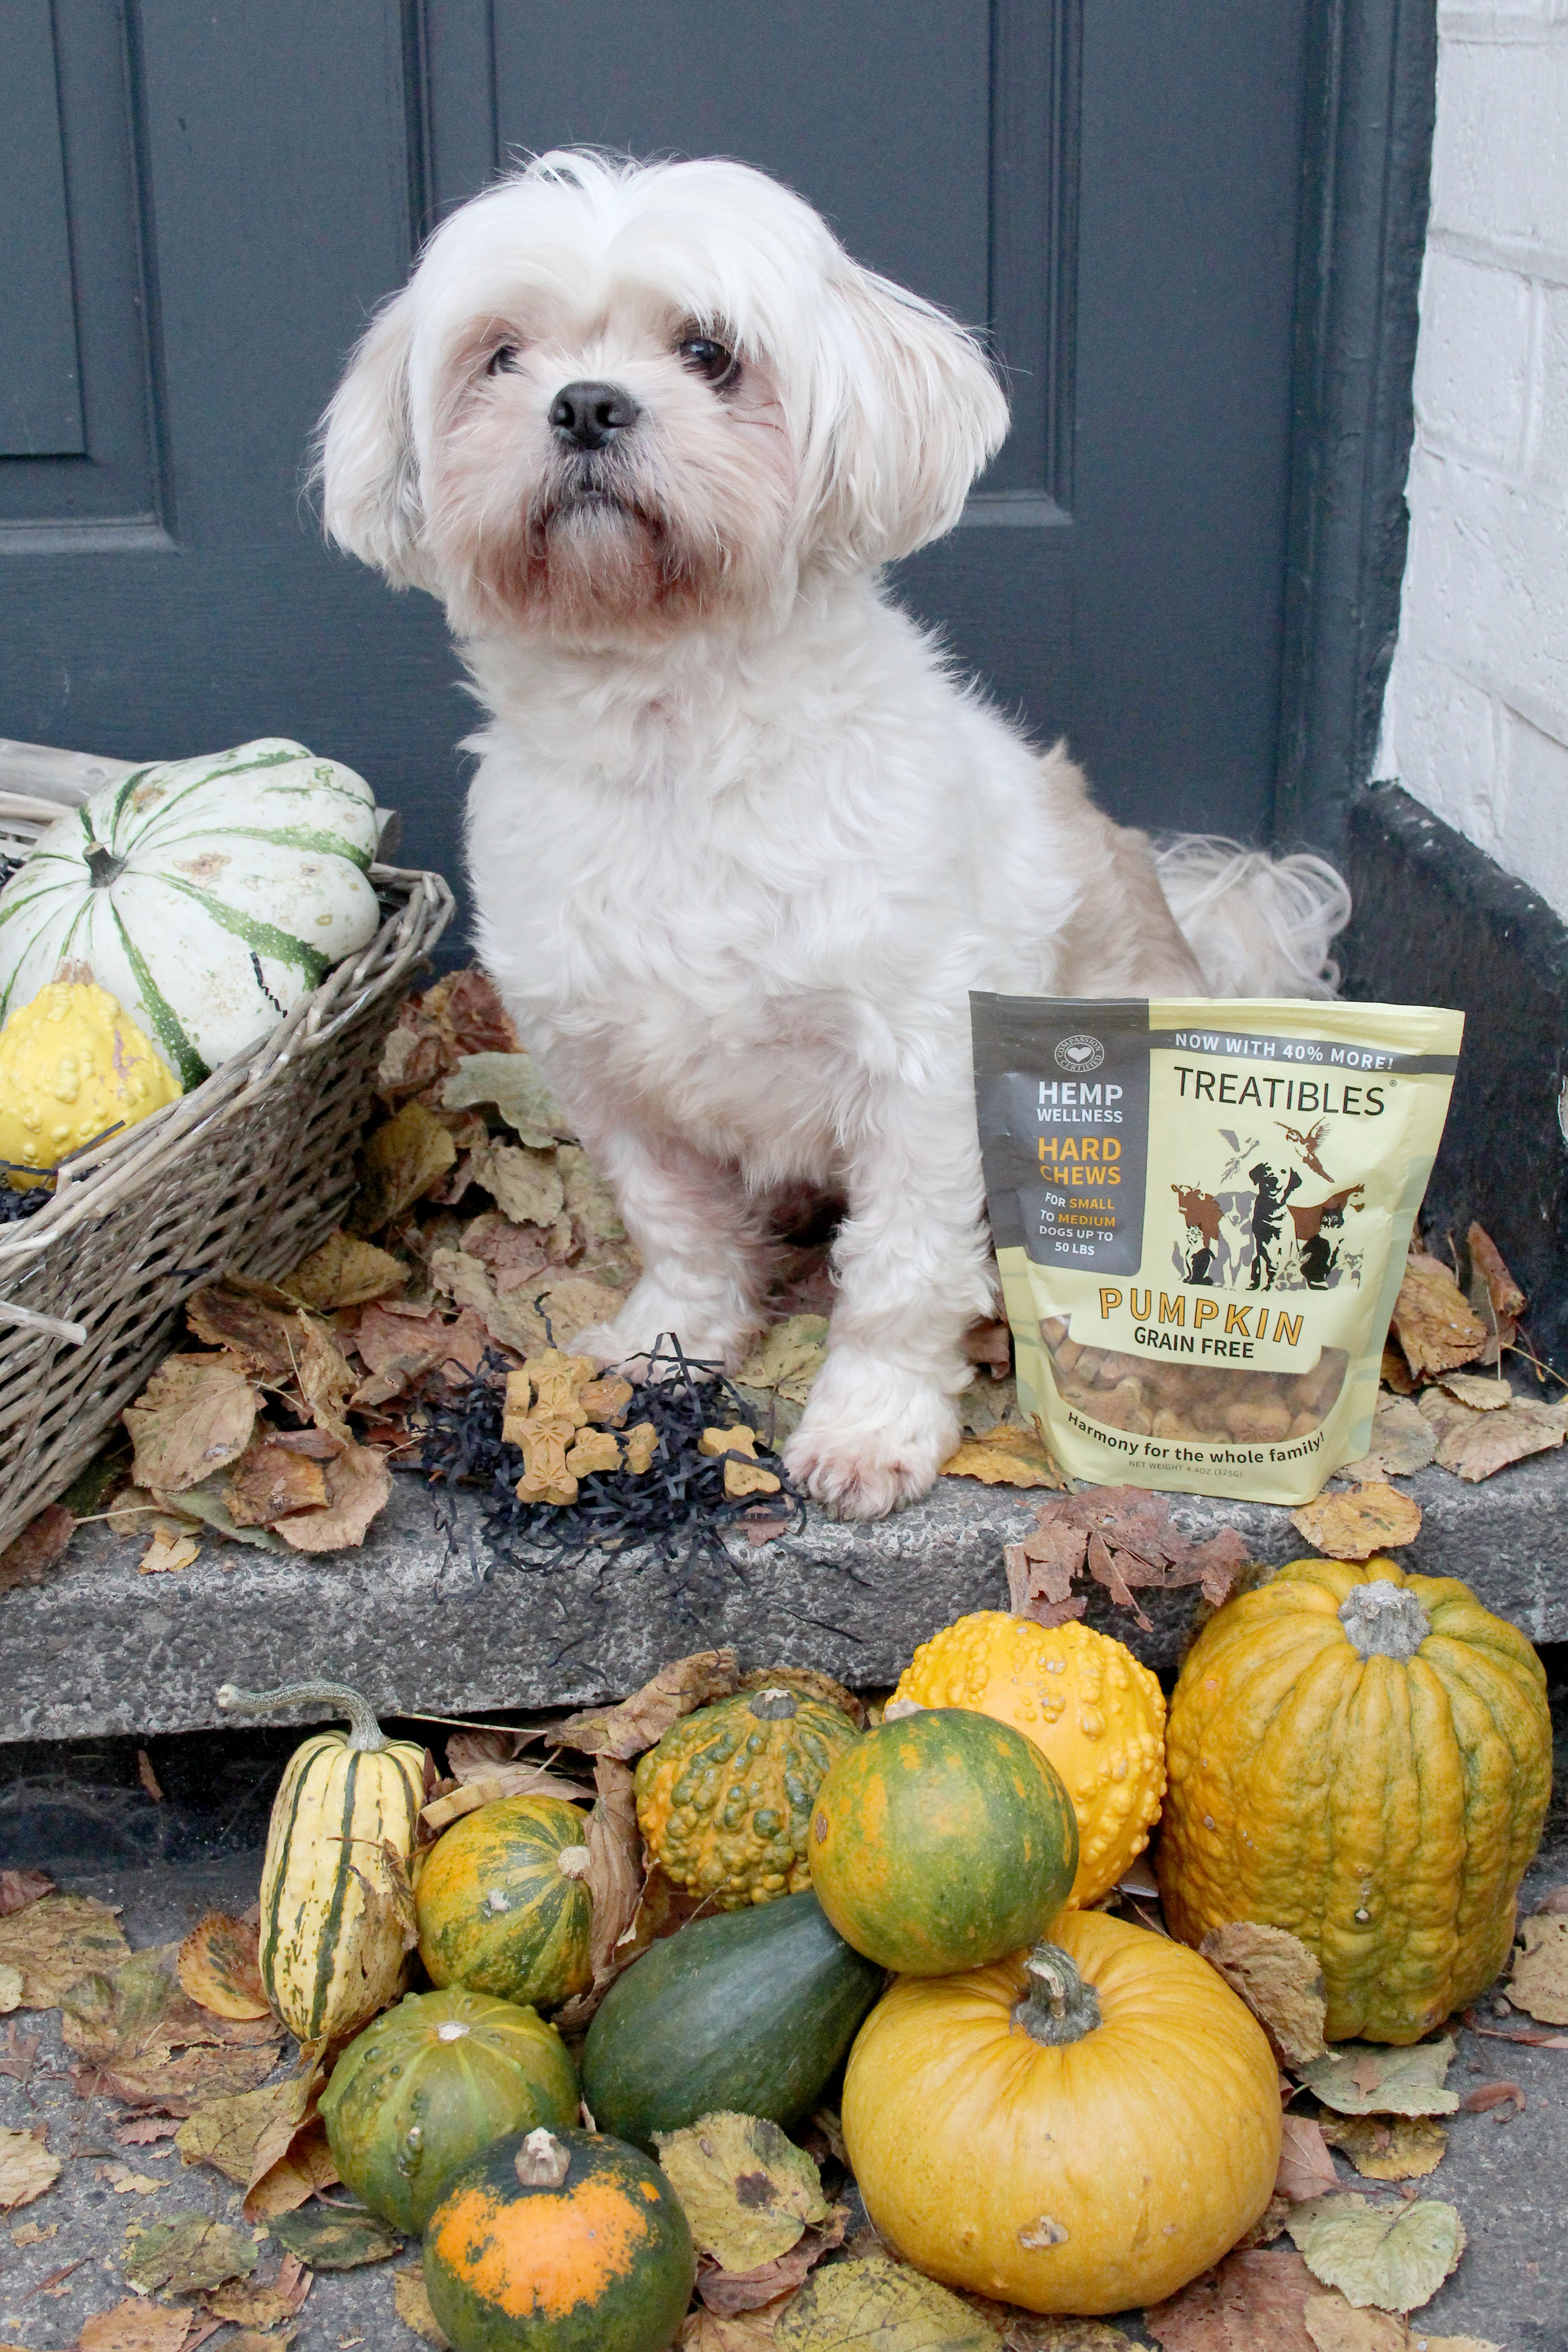 Houdini the dog with Treatibles CBD oil treats